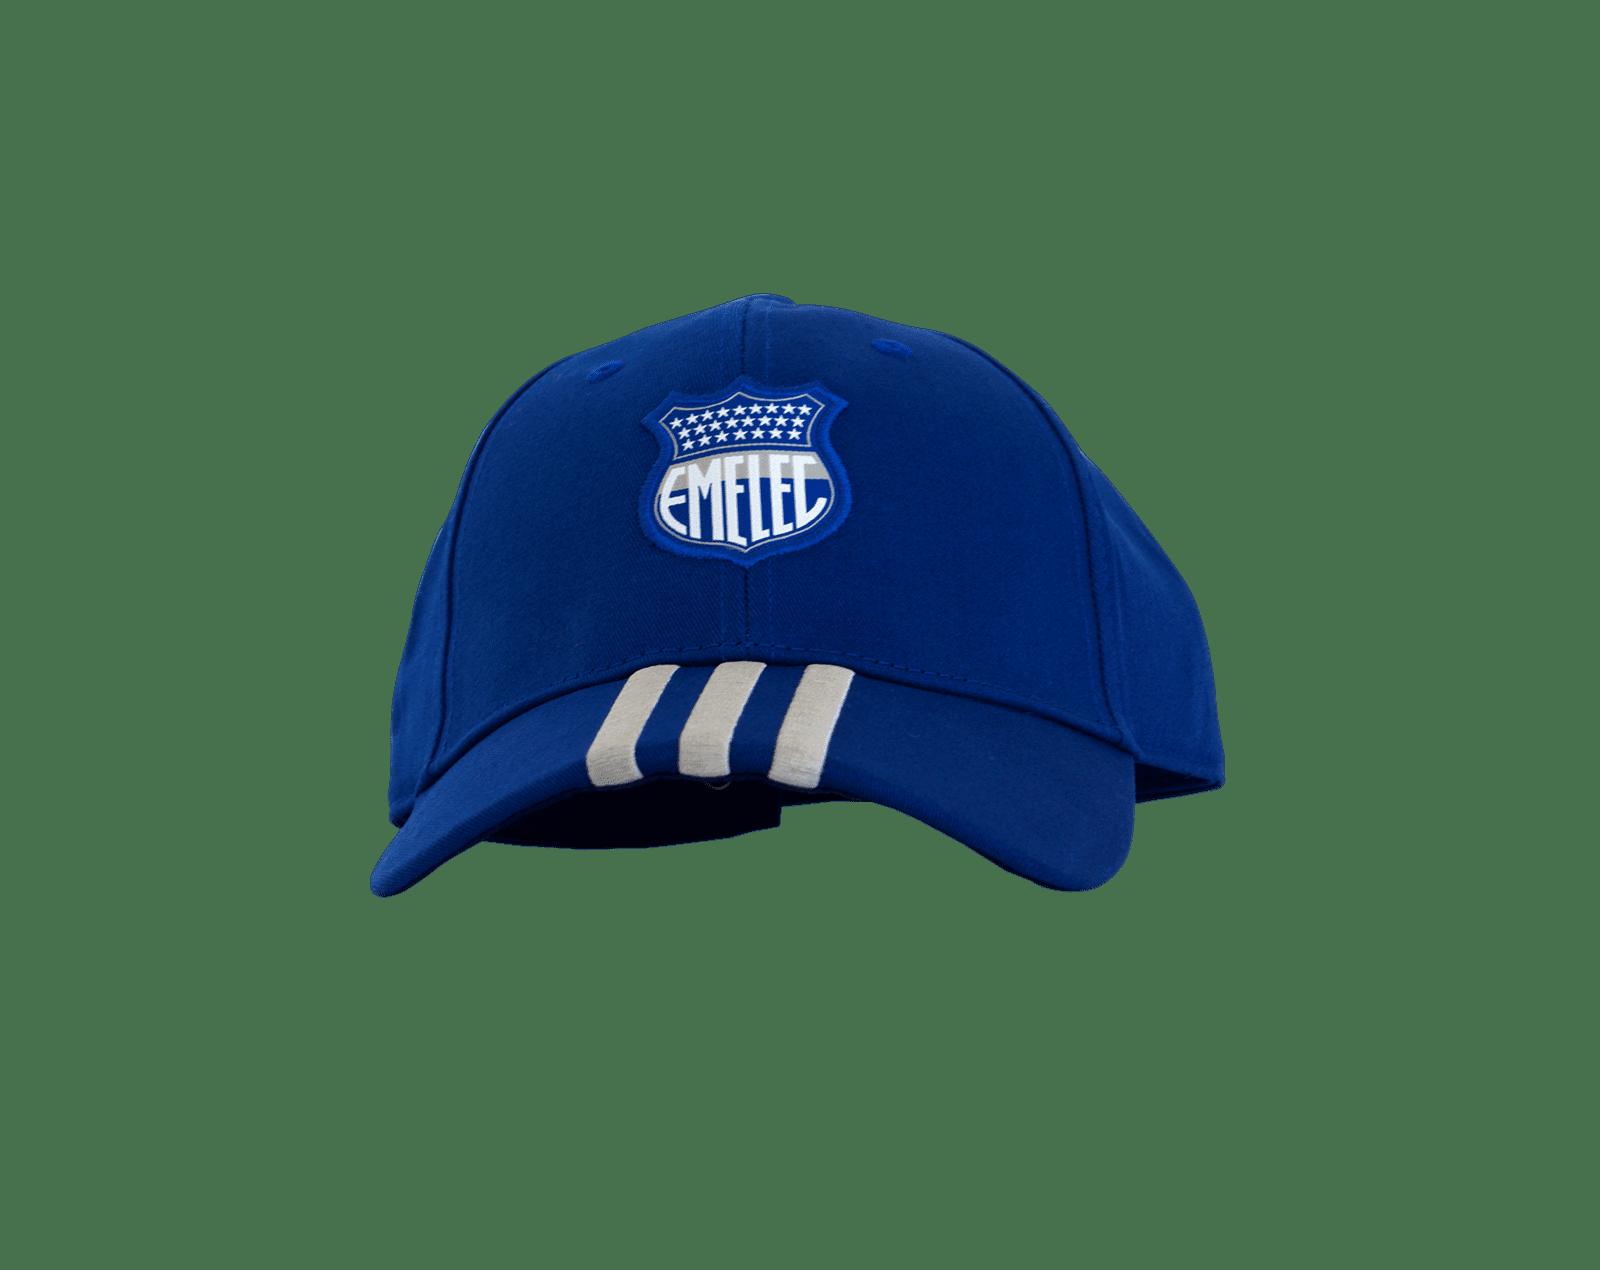 arquitecto Aparte apoyo  593 Sports | Shop